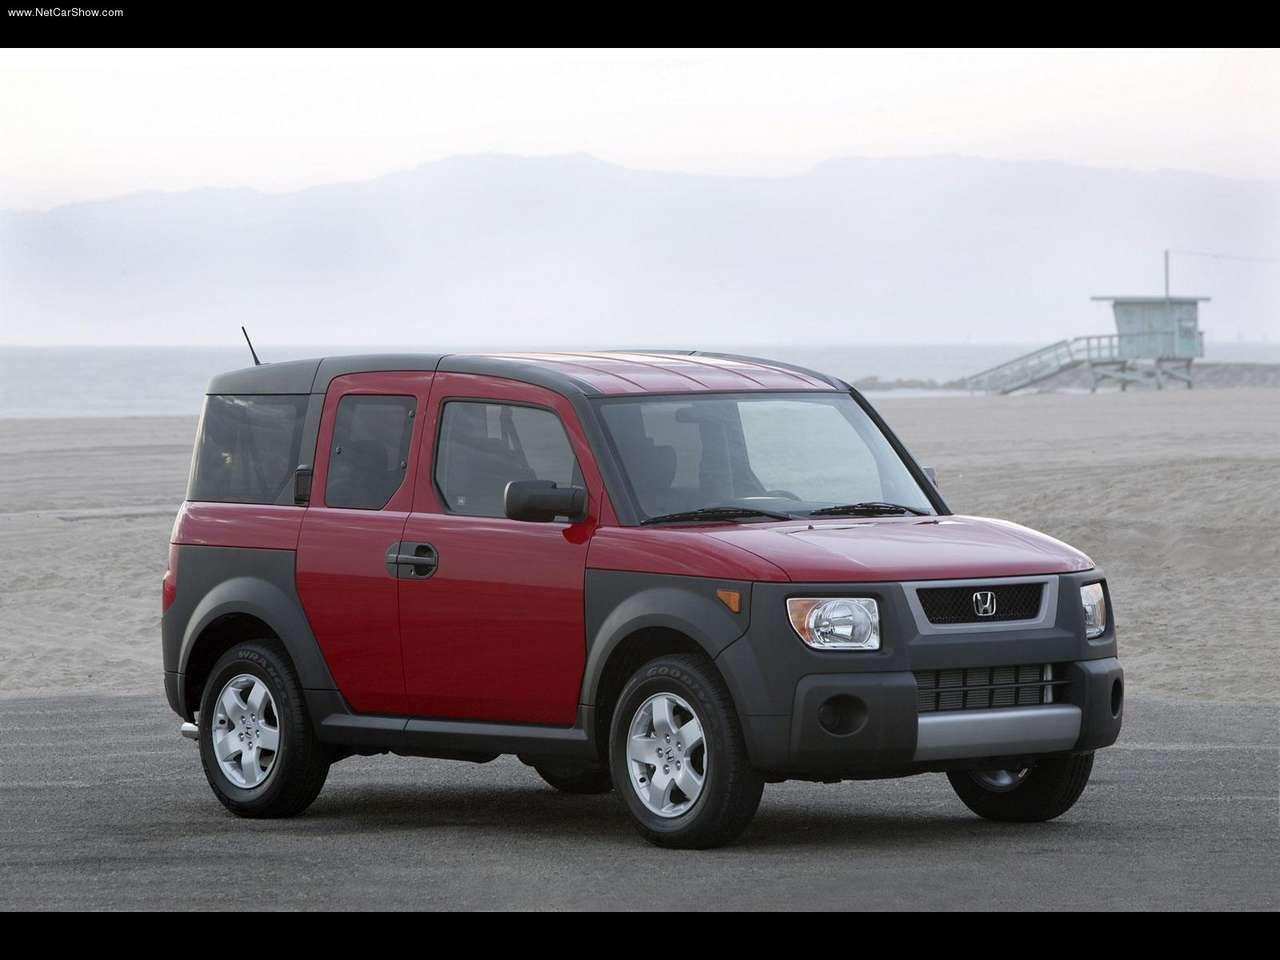 Ford Escape Dimensions >> 2005 Honda Element